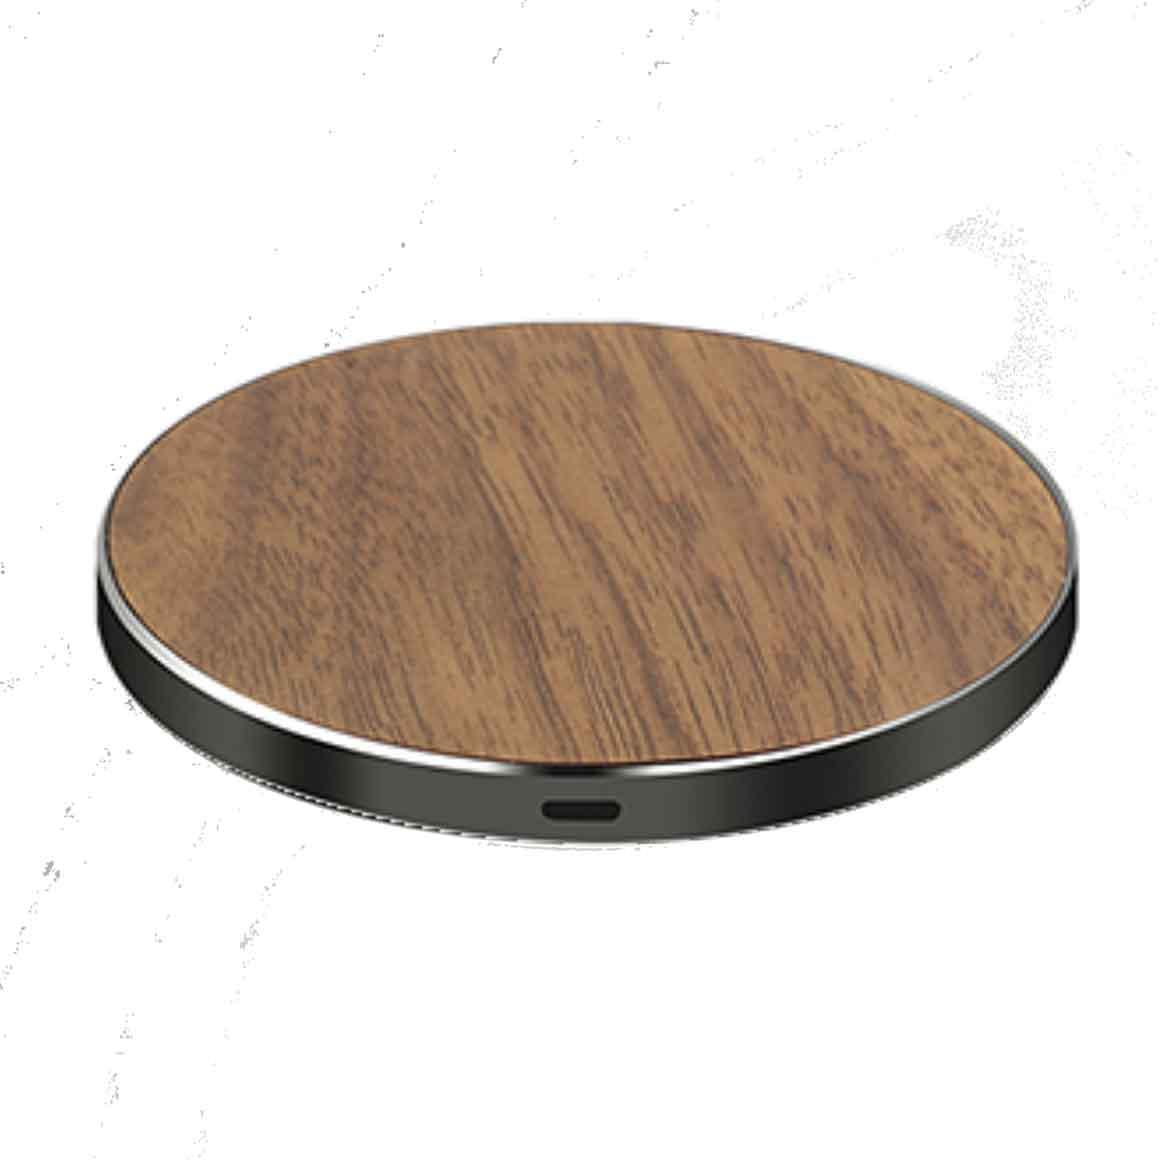 LuxeTech - Round Walnut Wood+ Black Aluminum wireless charger   Trada Marketplace